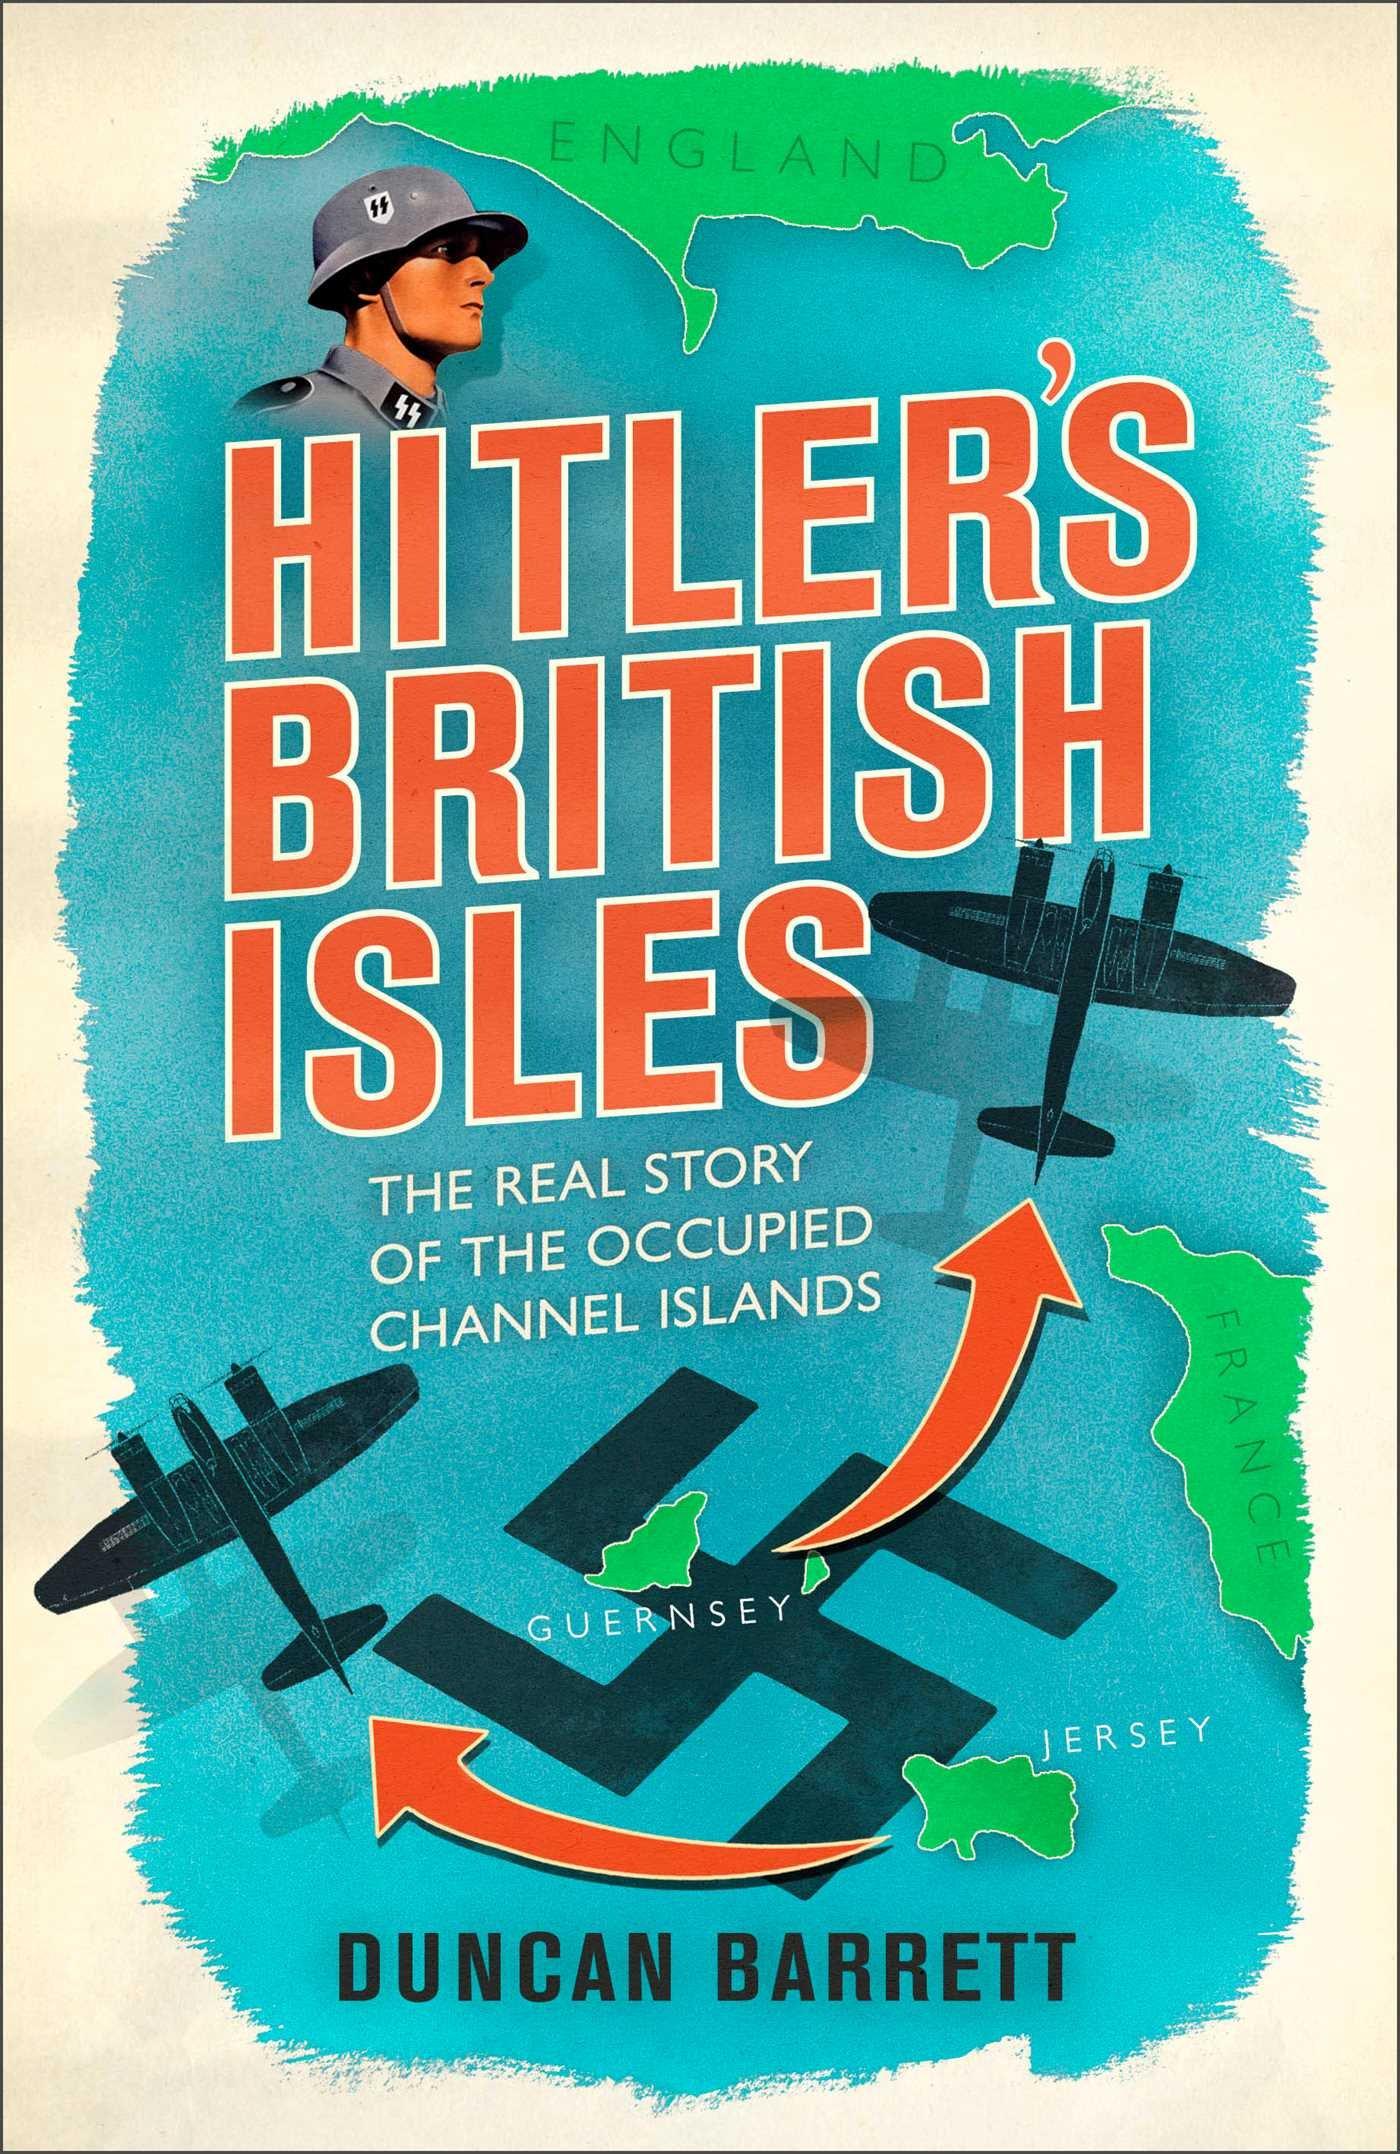 Download Hitler's British Isles Text fb2 ebook